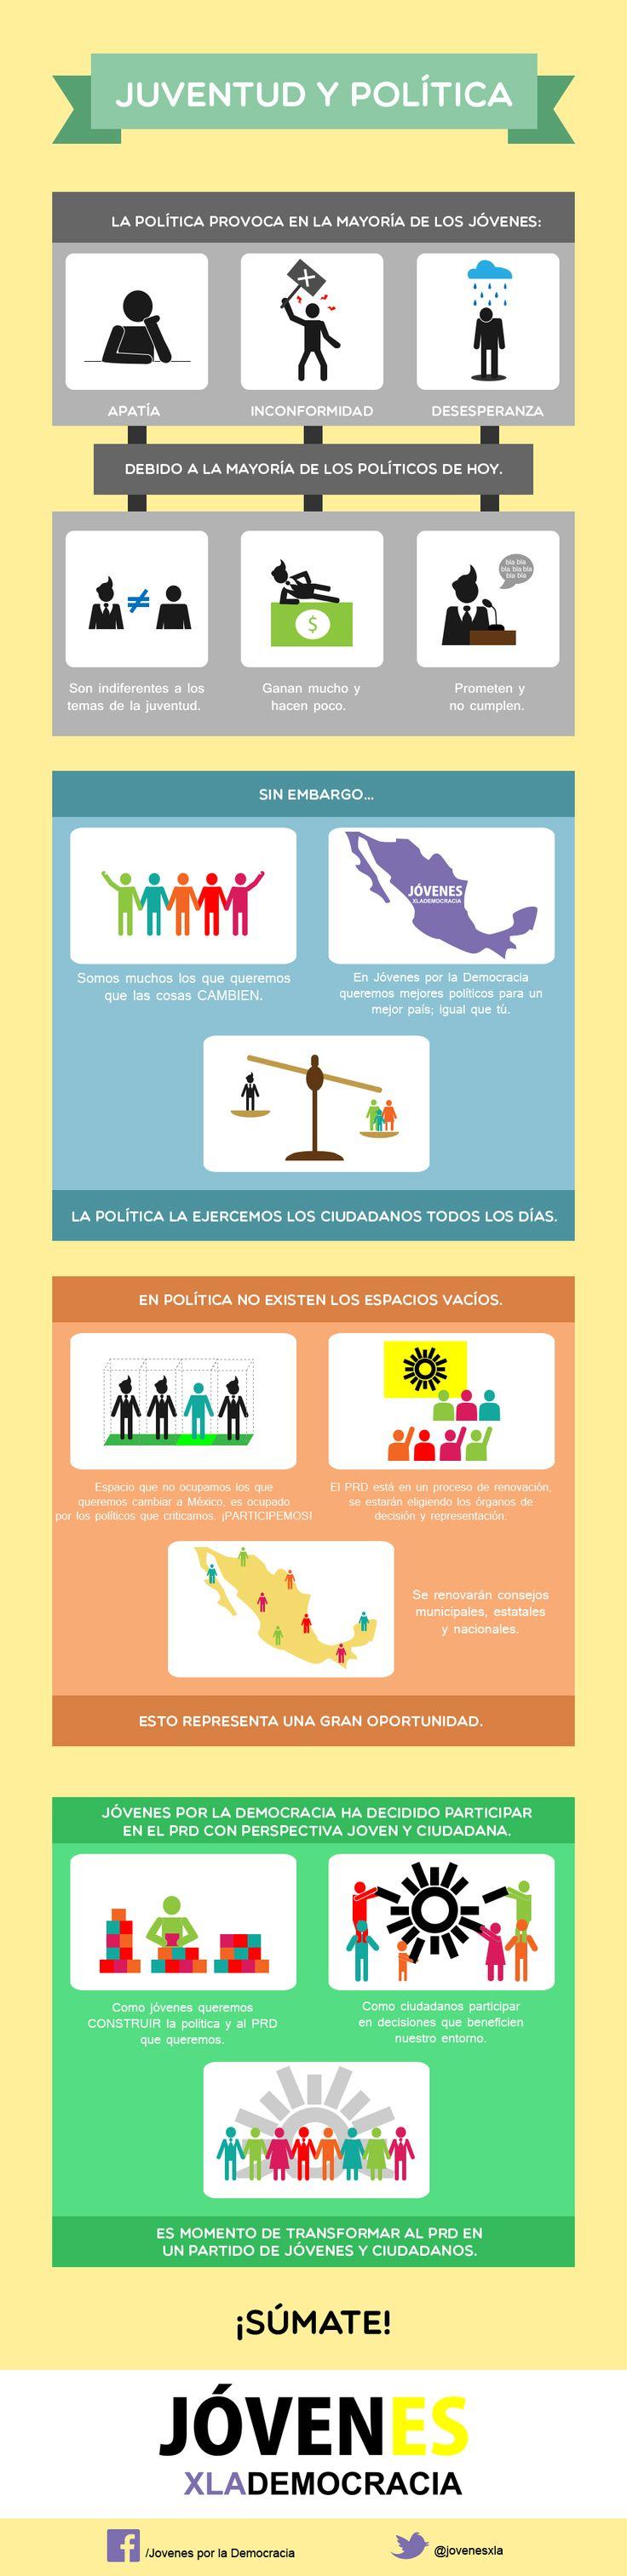 22 Best Subjuntivo Images On Pinterest Ap Spanish Teaching